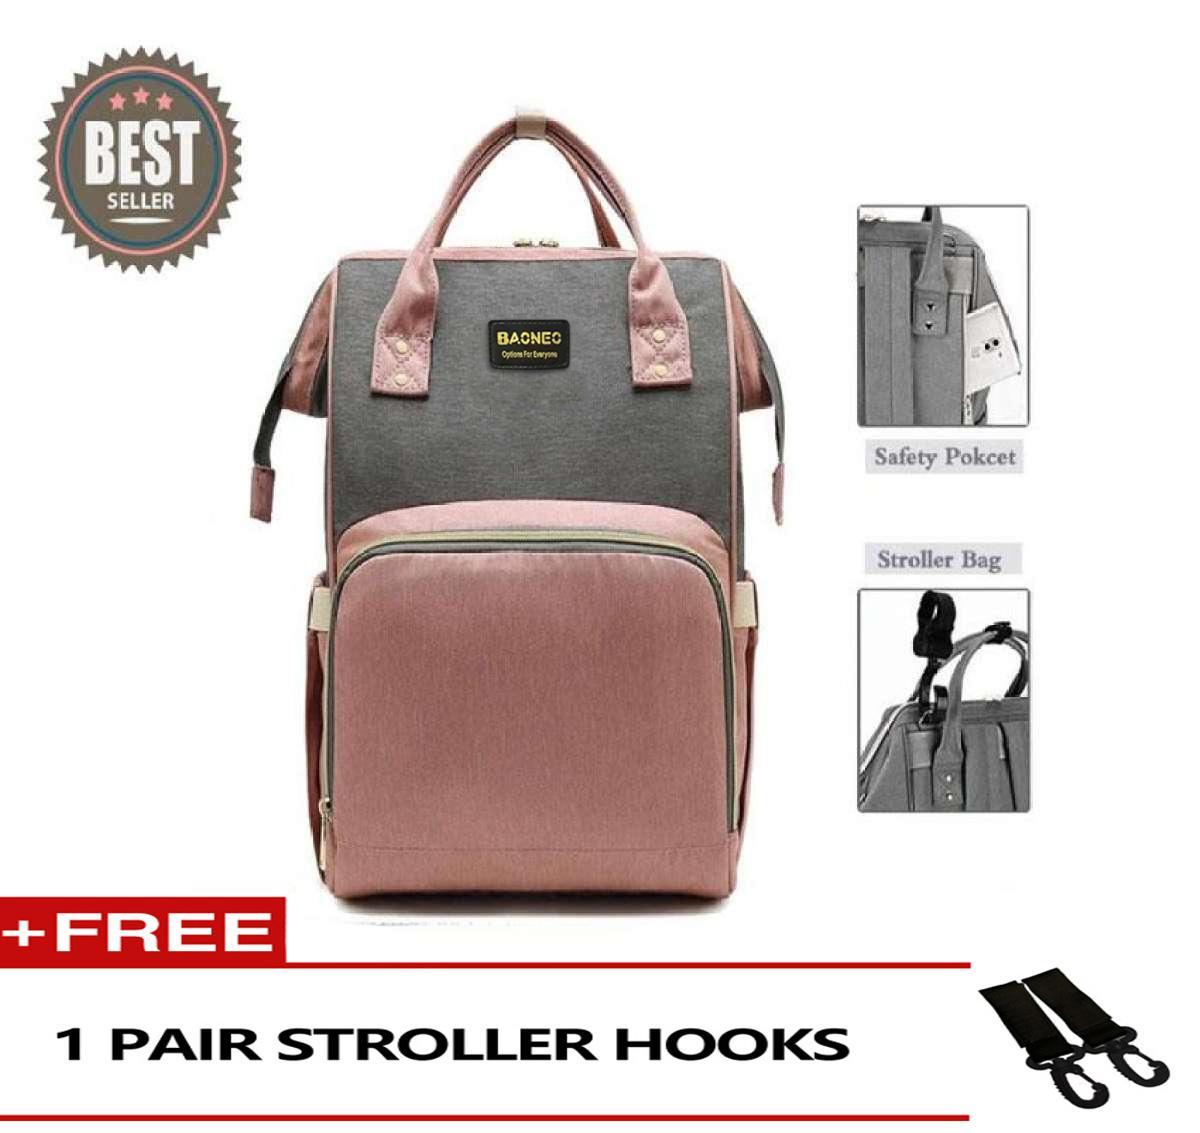 25faa1be405 New Upgrade Fashion Mummy Maternity Nappy Bag Large Capacity Baby Bag  Travel Backpack Designer Nursing Bag